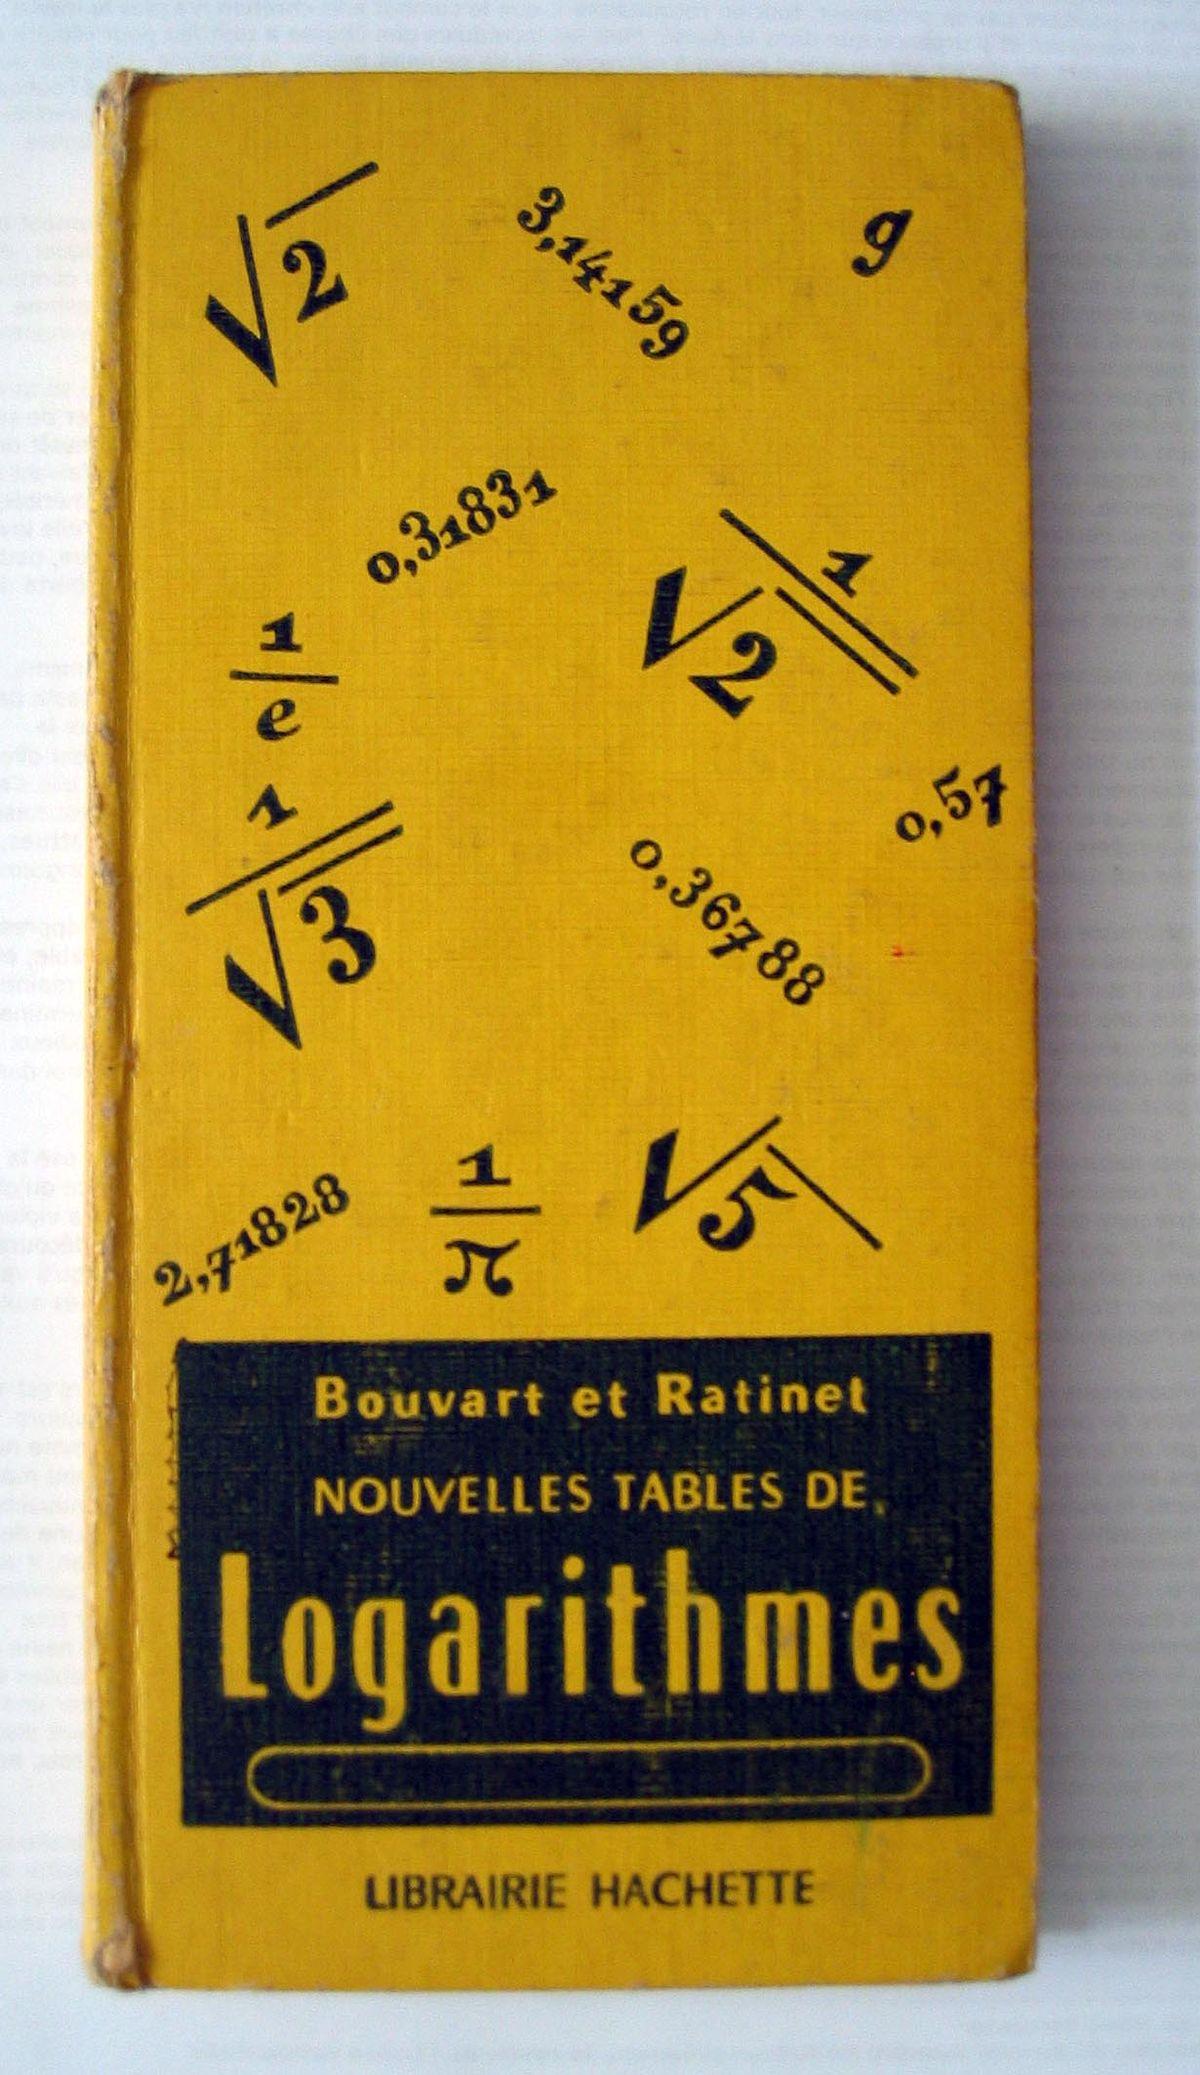 Table de logarithmes wikip dia - La table de l ill illkirch ...